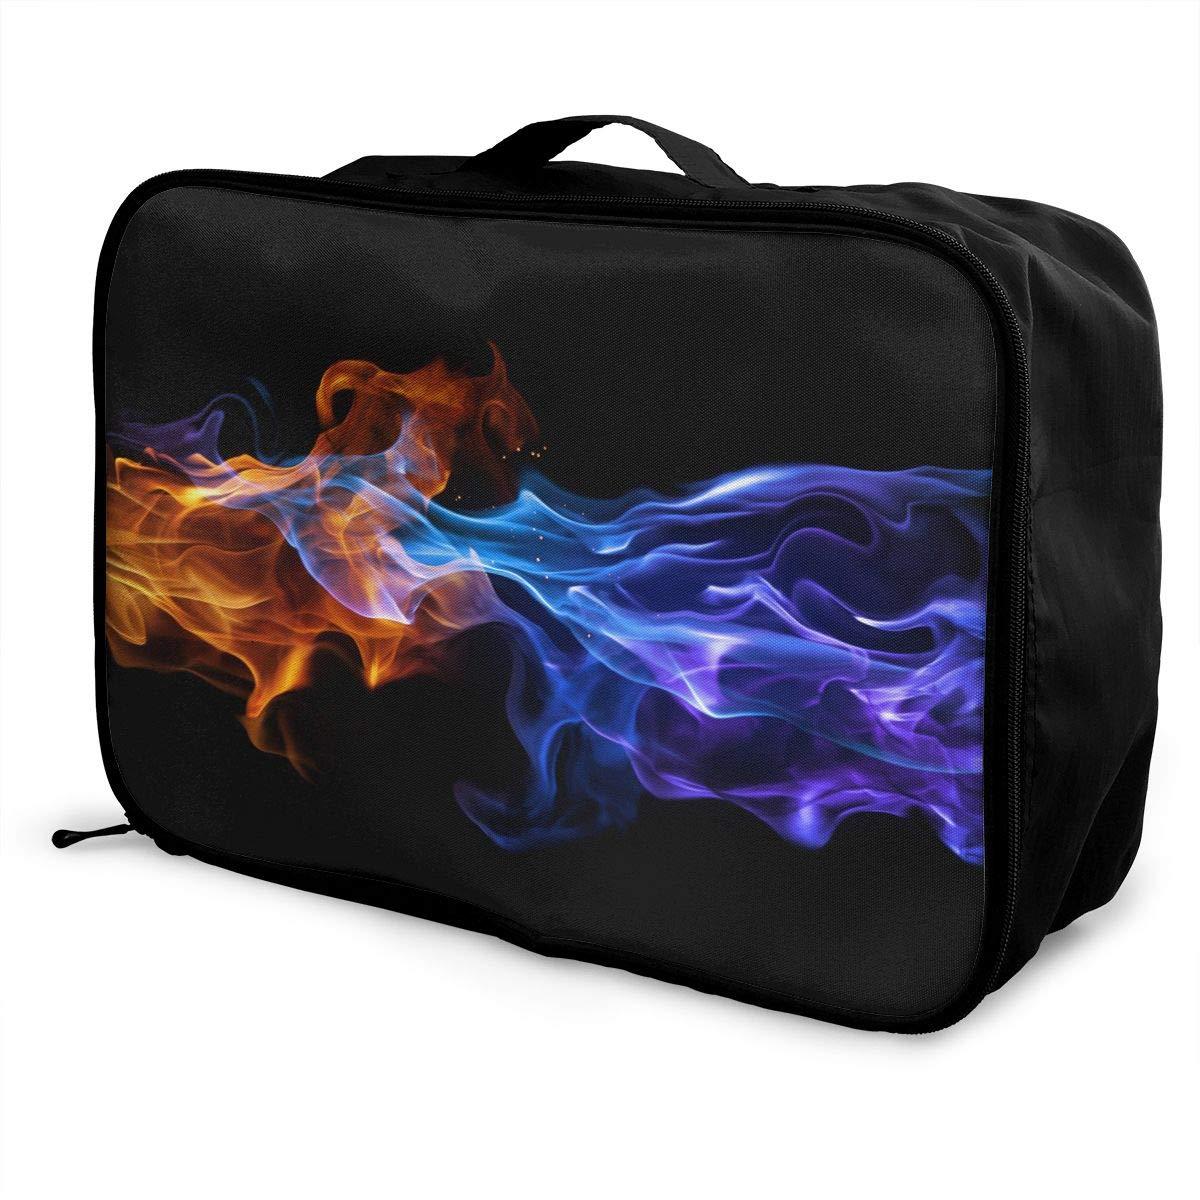 Travel Luggage Duffle Bag Lightweight Portable Handbag Blue Fire Pattern Large Capacity Waterproof Foldable Storage Tote